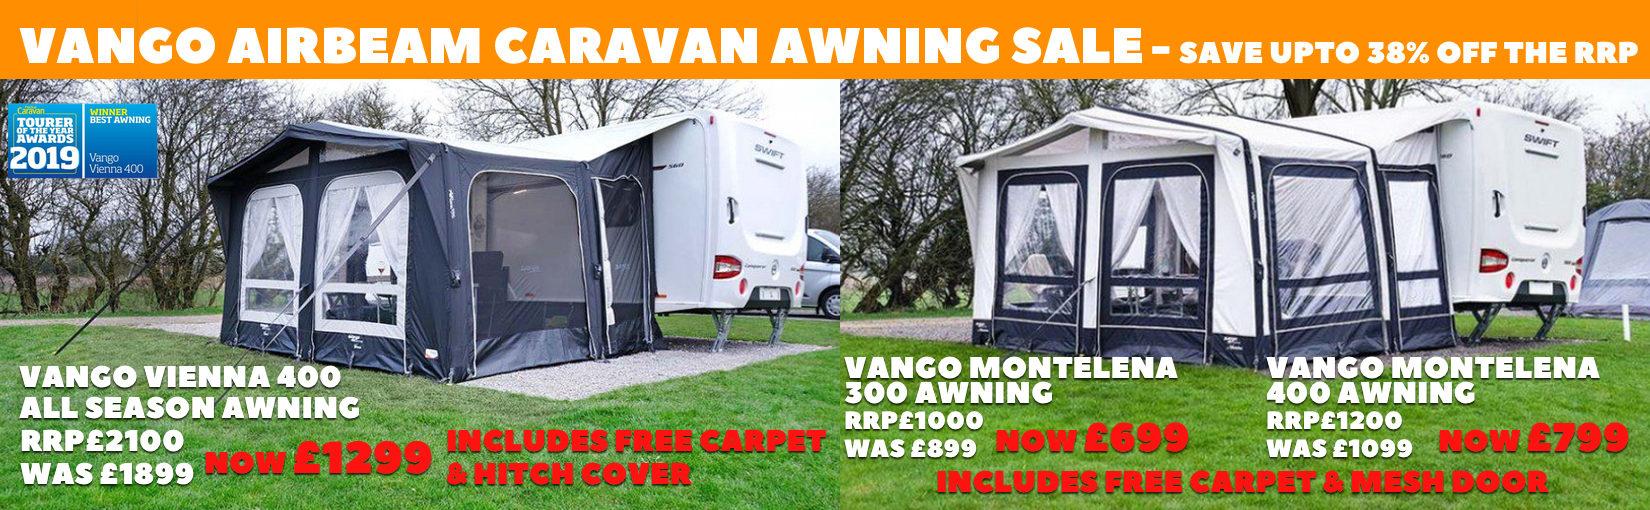 Vango Awning Sale September20